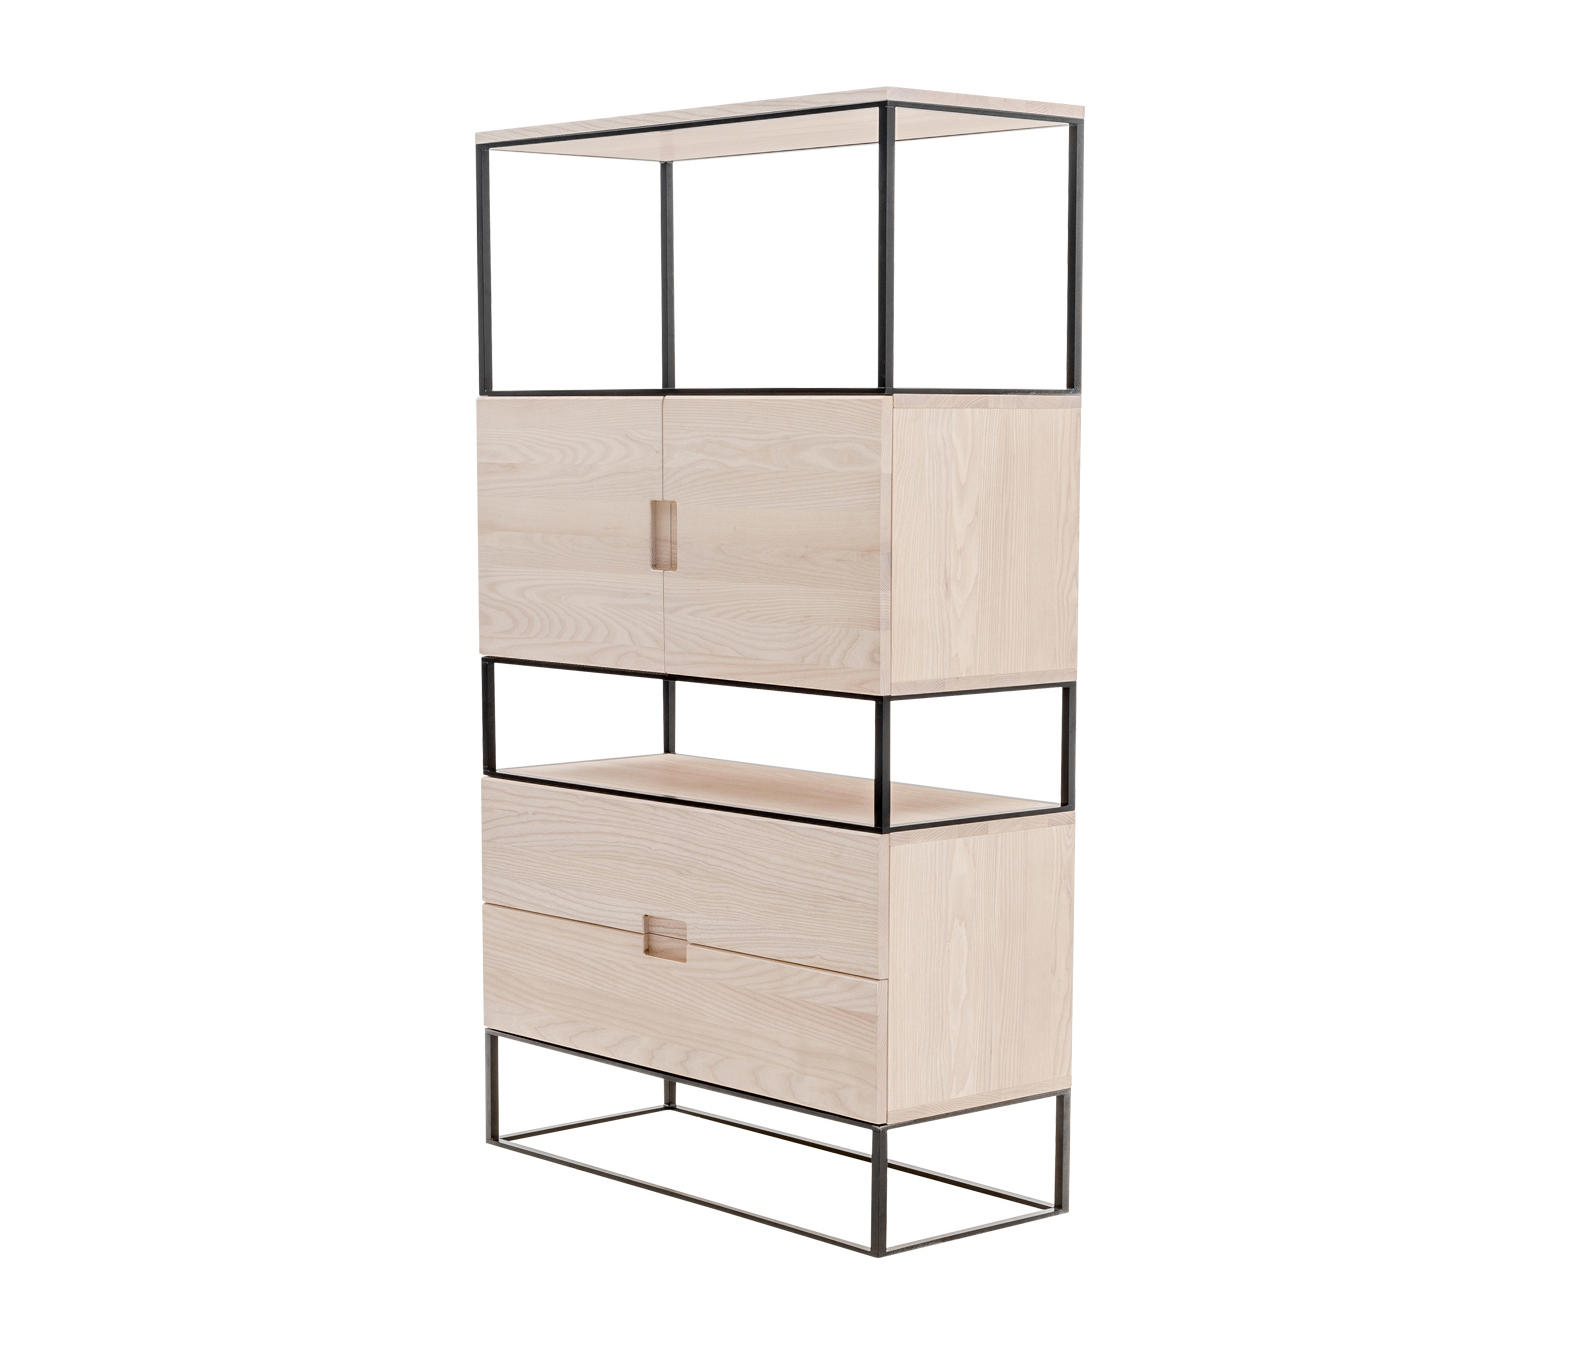 fischer estanter a de objekte unserer tage architonic. Black Bedroom Furniture Sets. Home Design Ideas